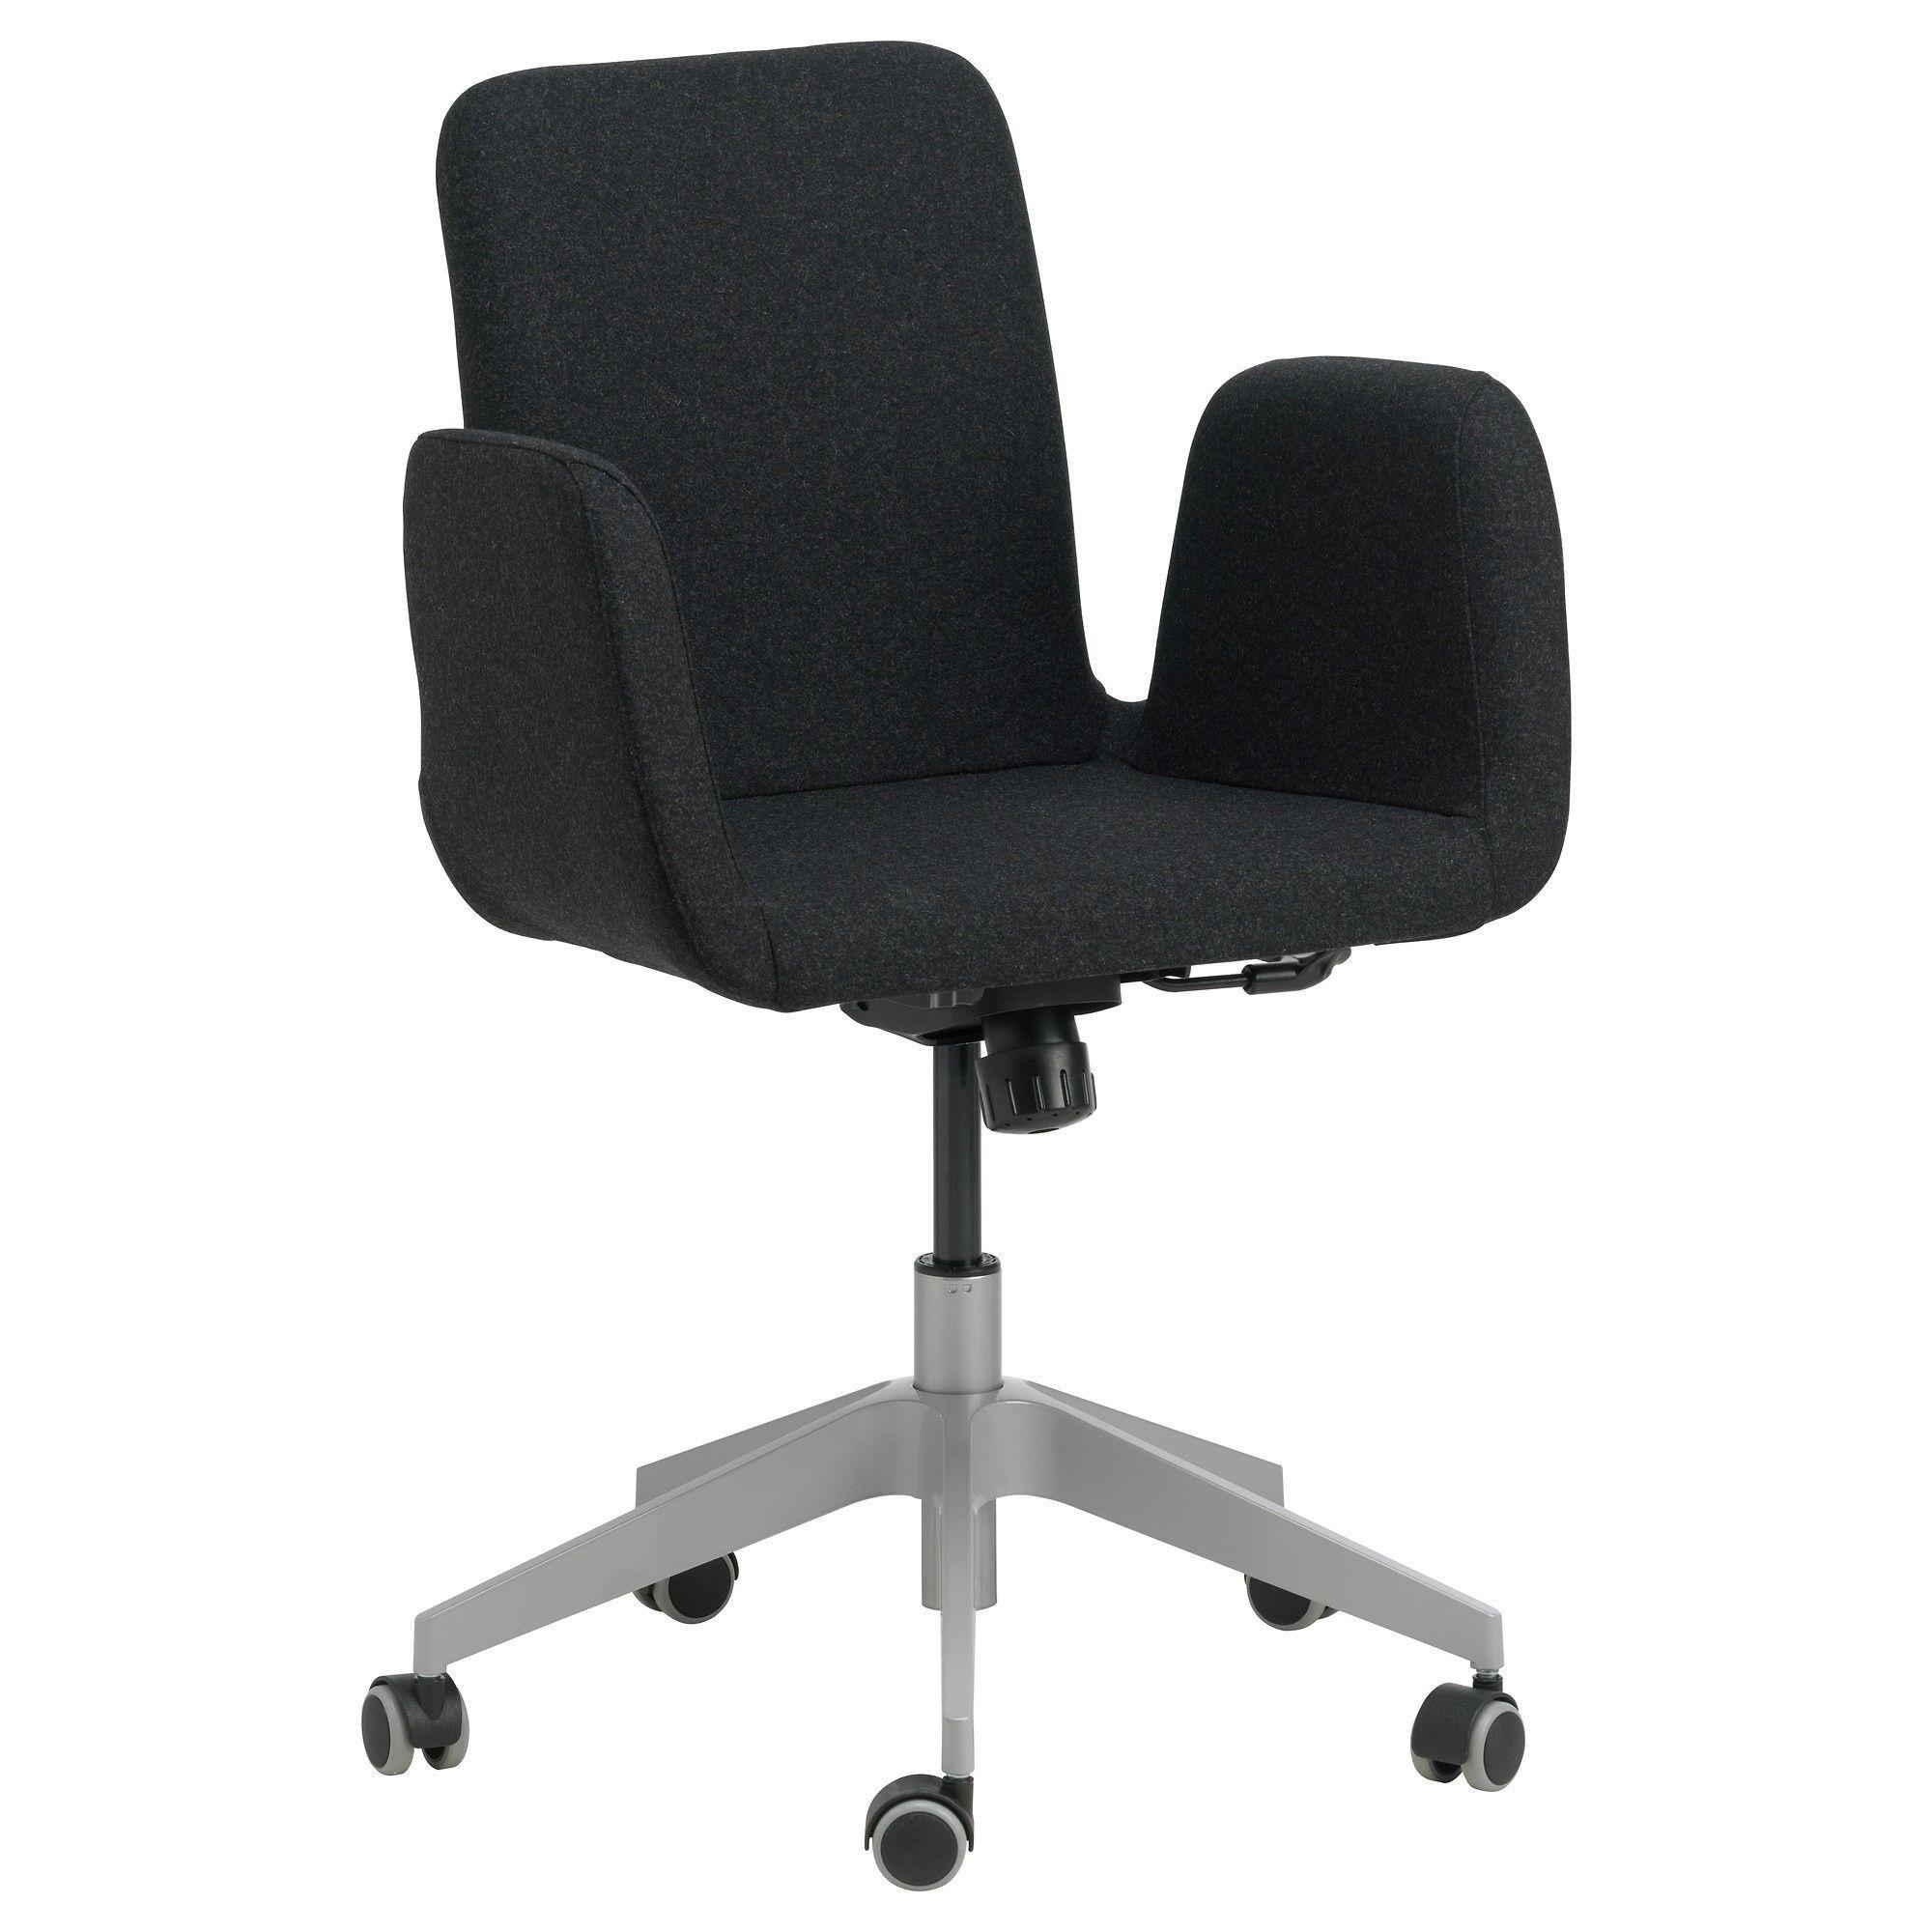 13 Simpliste Rehausseur Chaise Ikea Images Office Chair Design Best Home Office Desk Ikea Office Chair